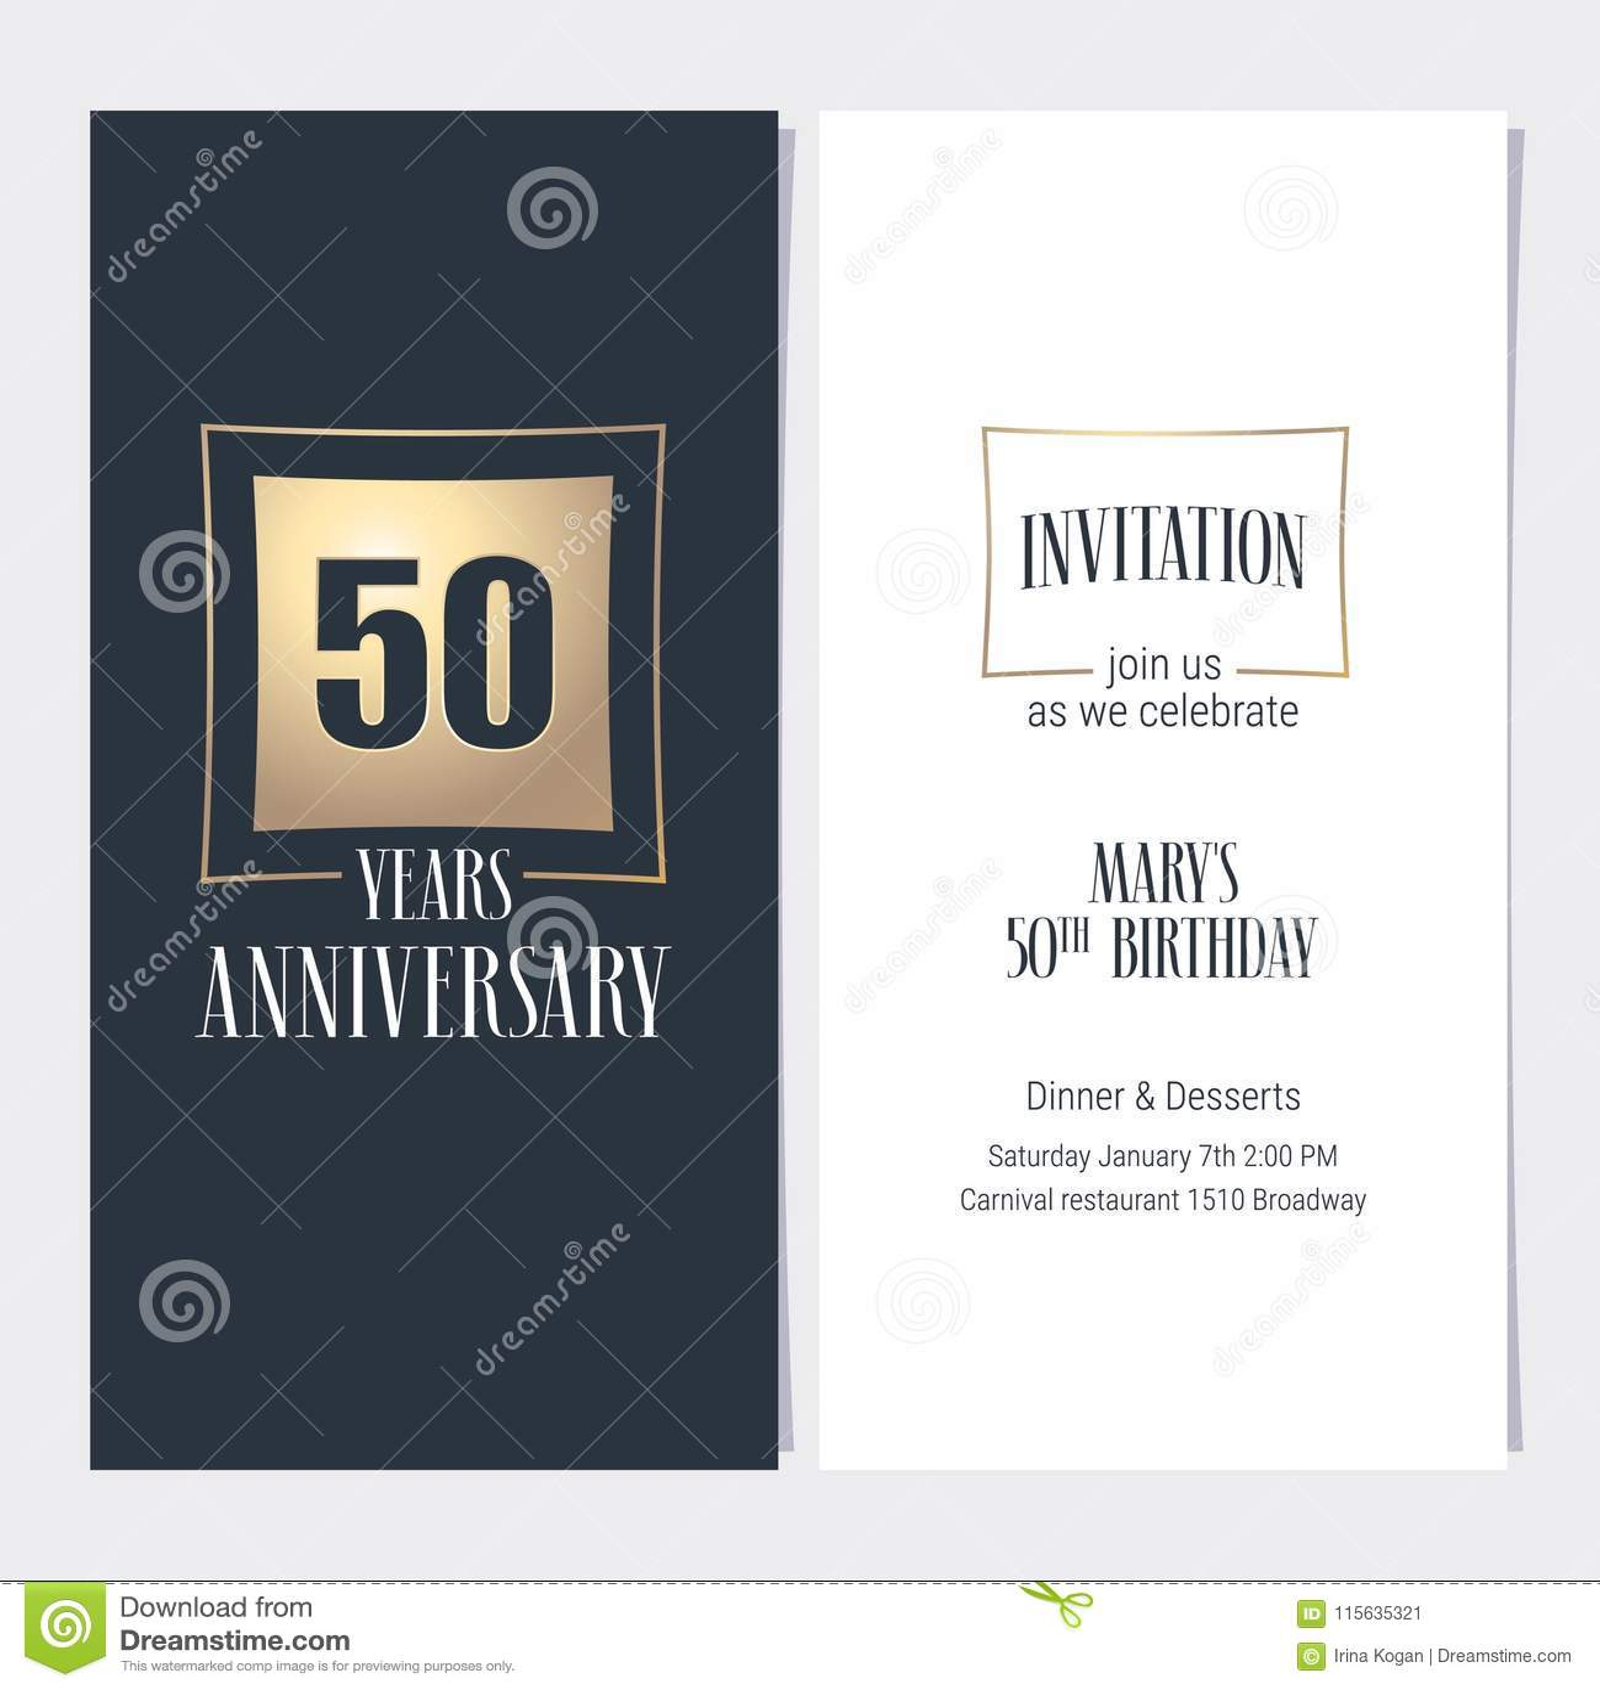 50 years anniversary invitation vector stock vector illustration download 50 years anniversary invitation vector stock vector illustration of element banner 115635321 stopboris Image collections